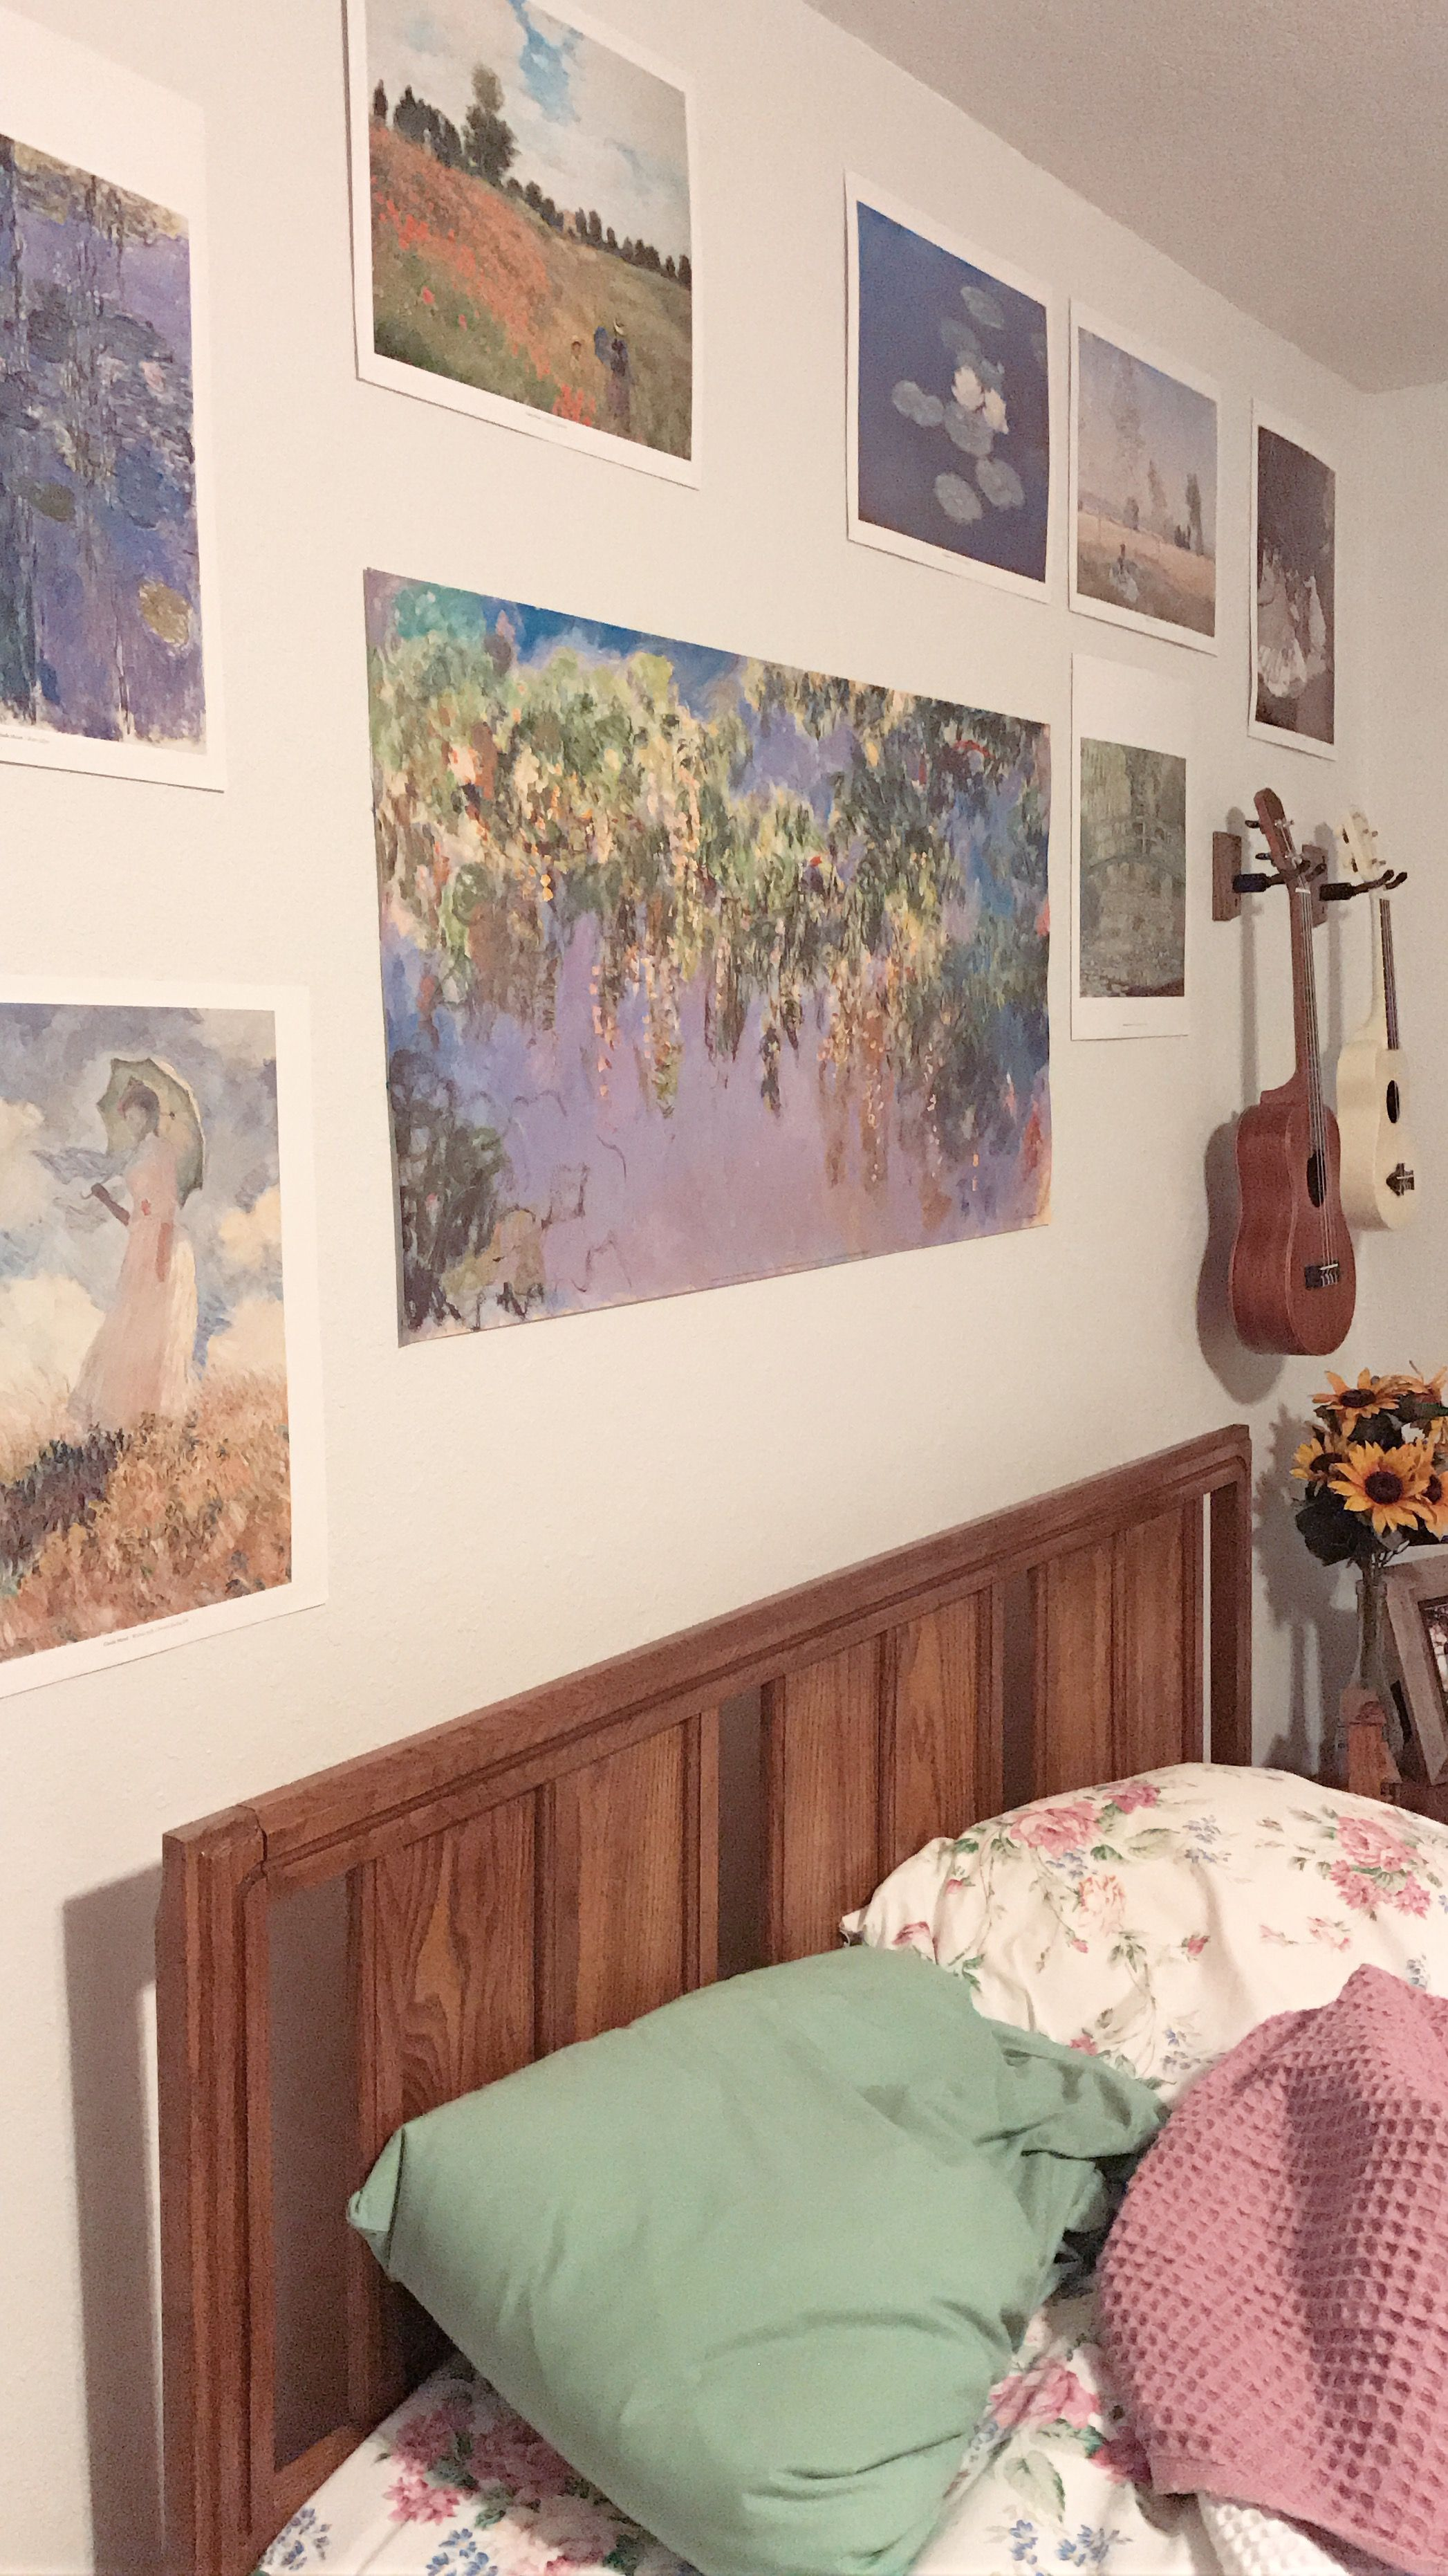 Art Hoe Room With Monet Poster Paintings Aesthetic Bedroom Aesthetic Rooms Creative Bedroom